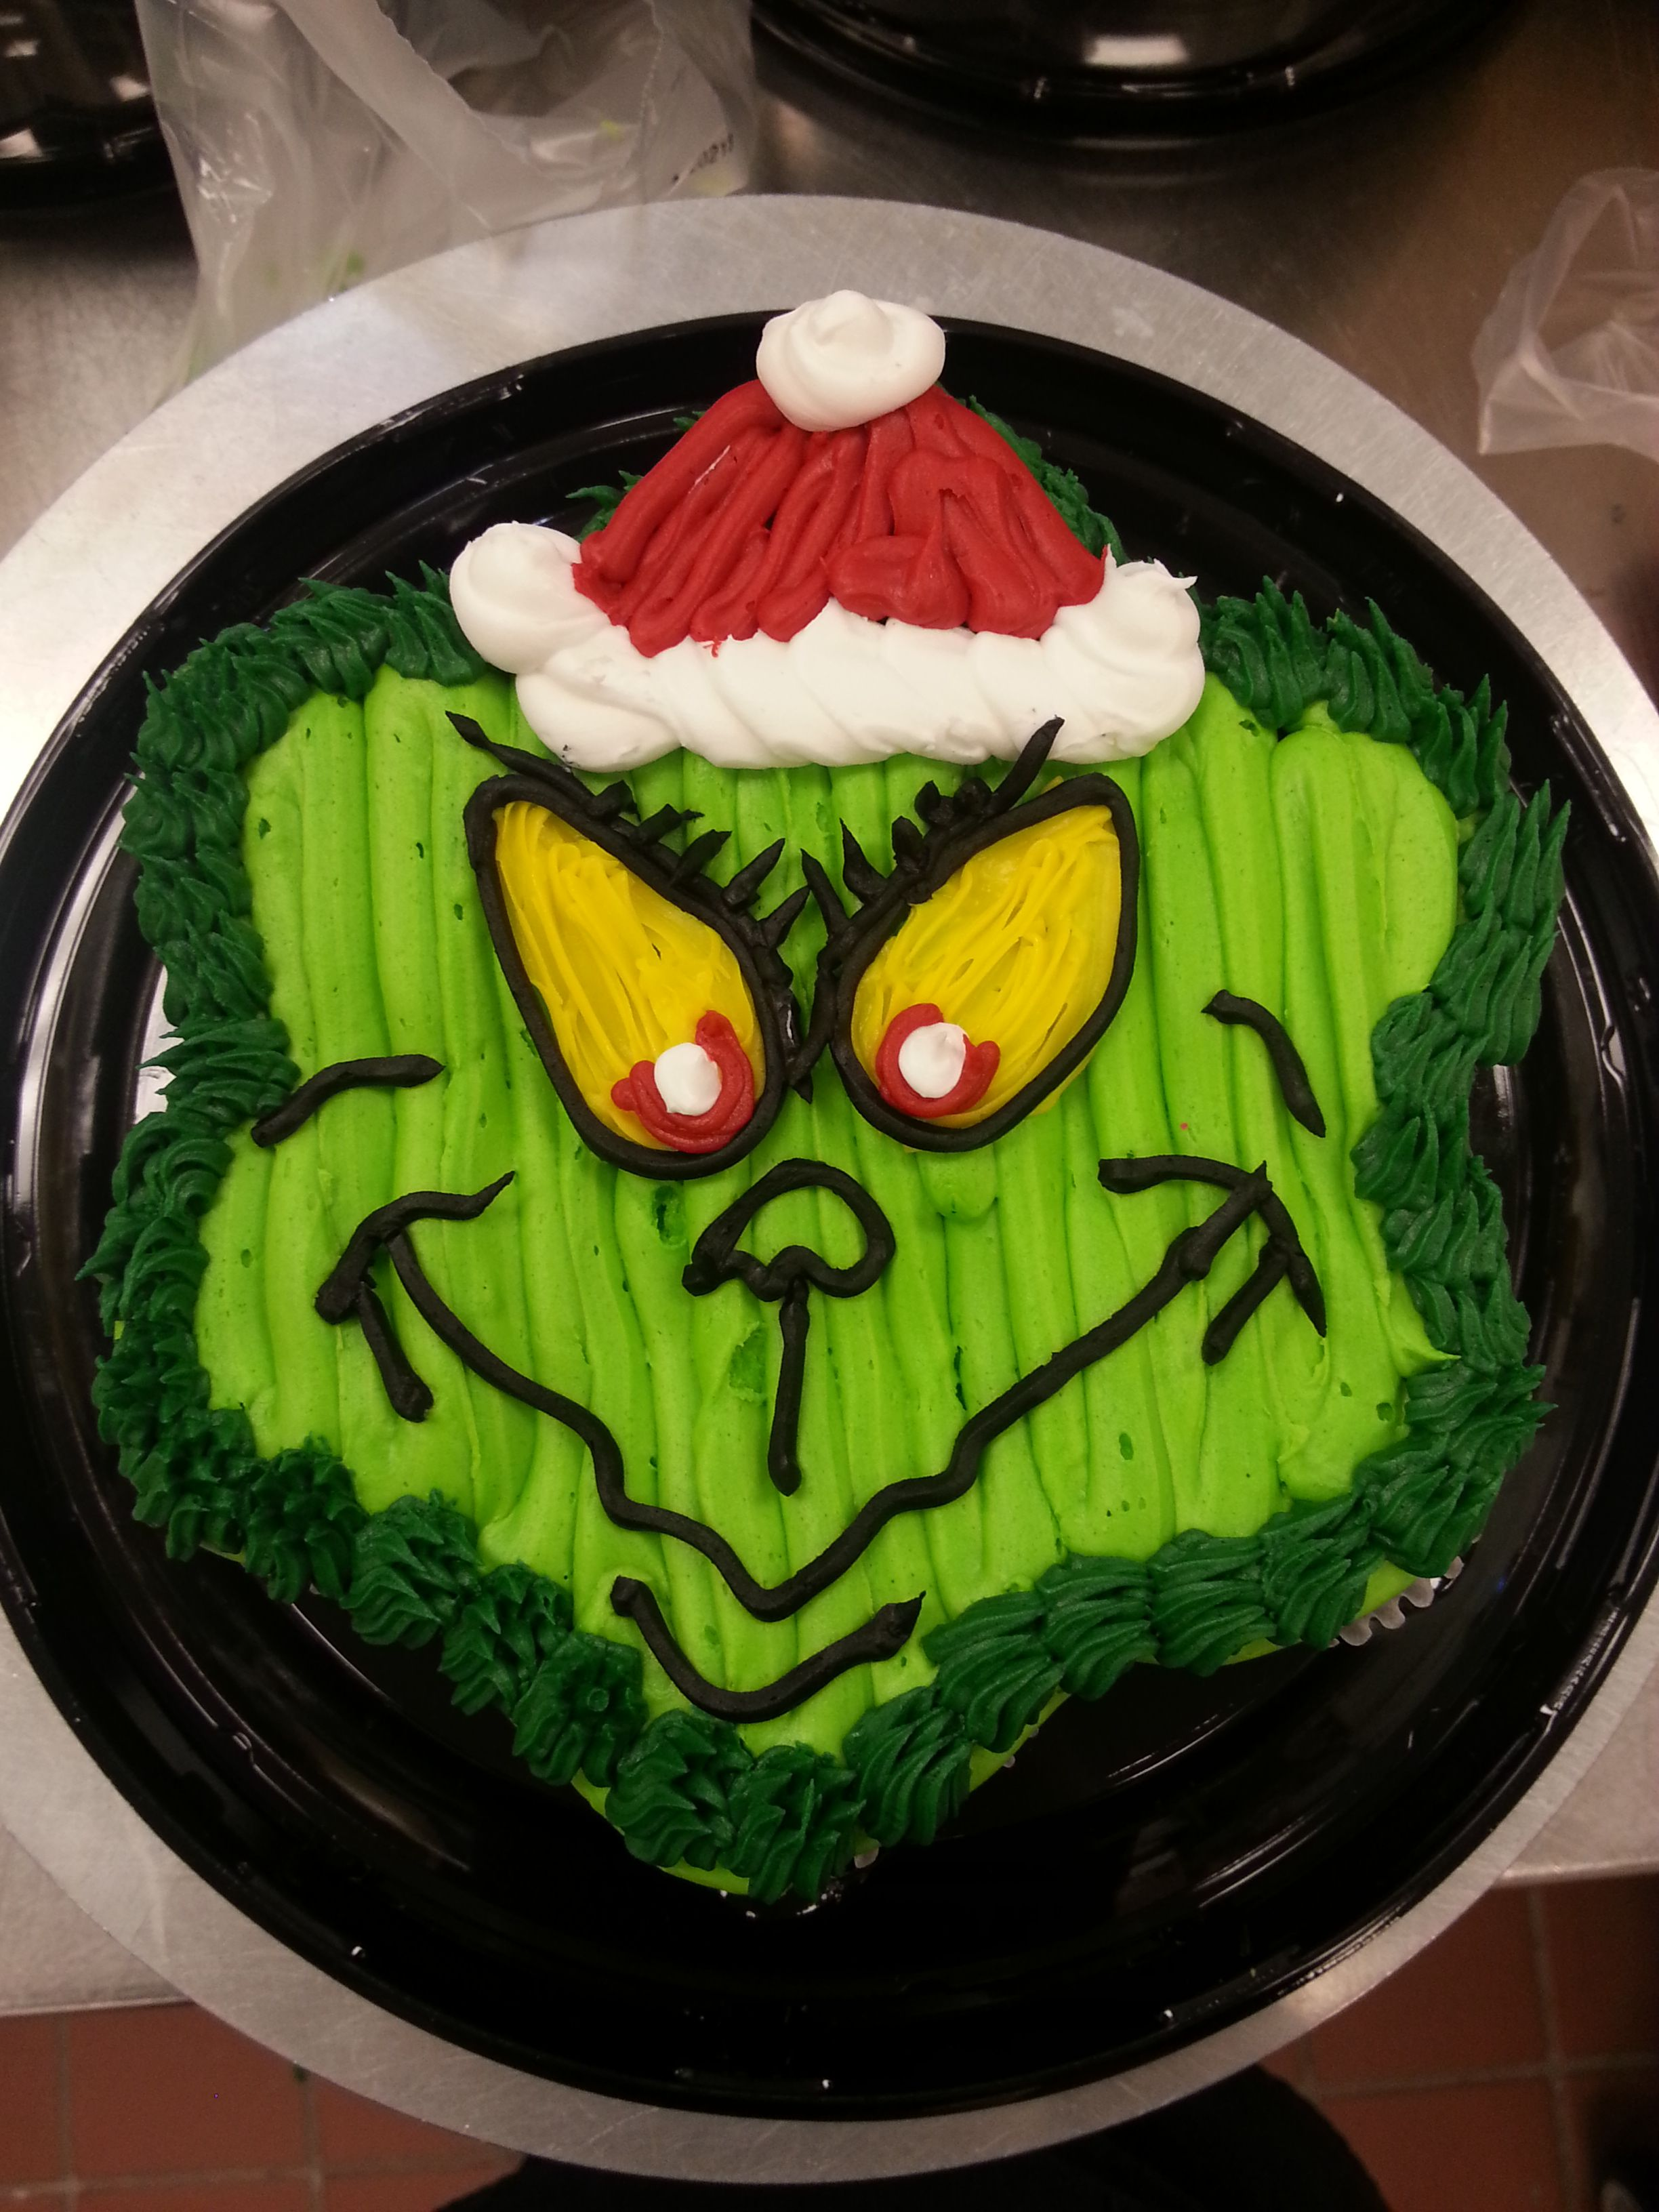 the Grinch cupcake cake